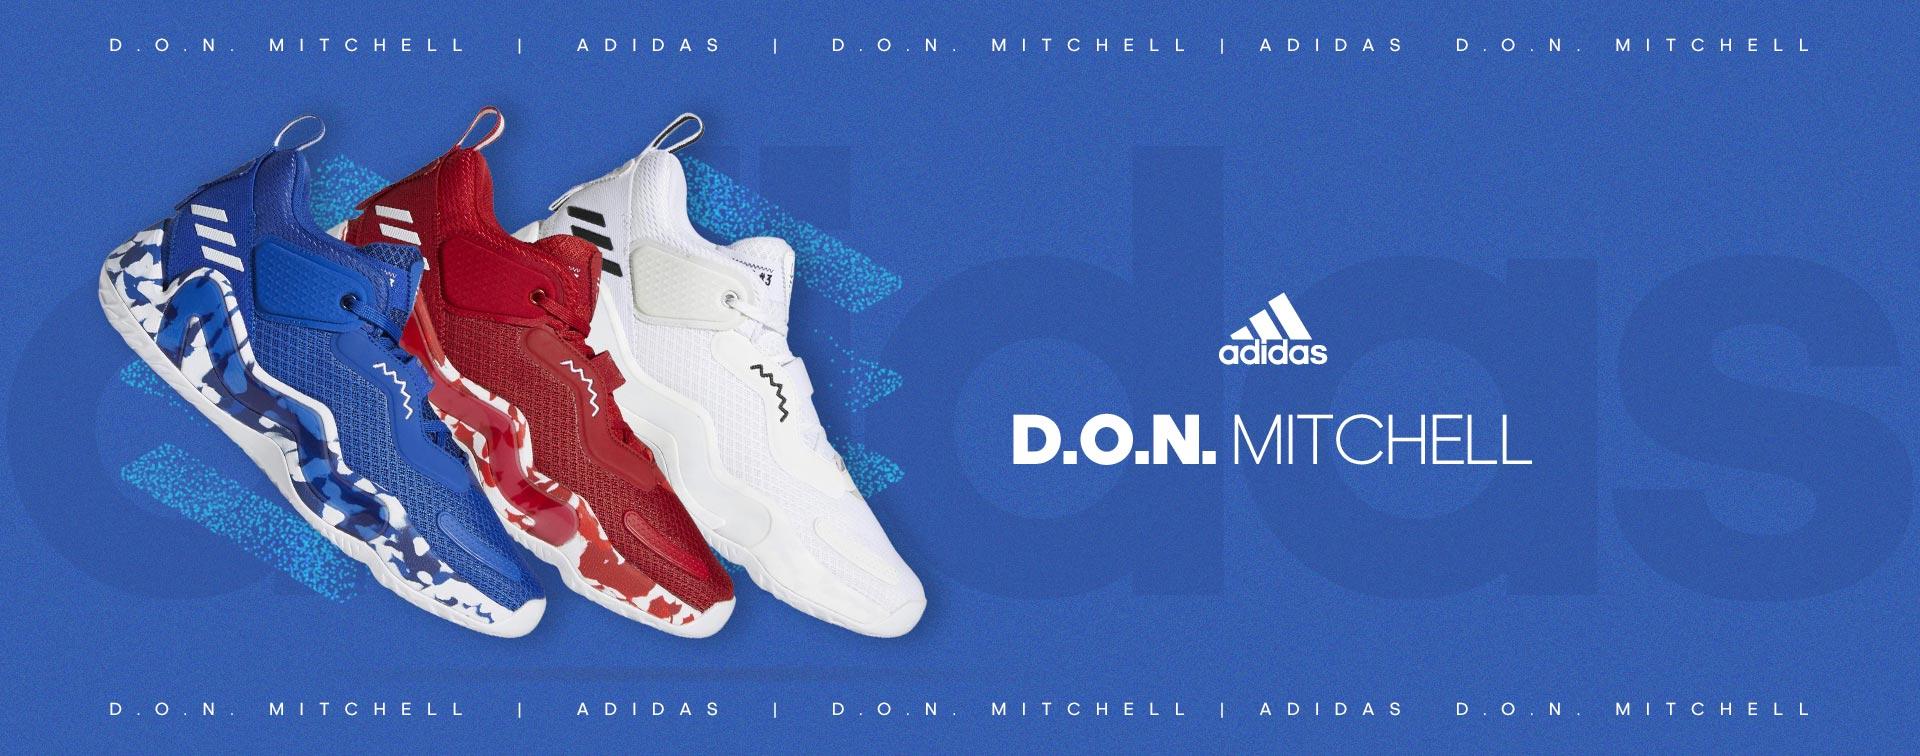 Chaussures de basketball adidas D.O.N. Mitchell